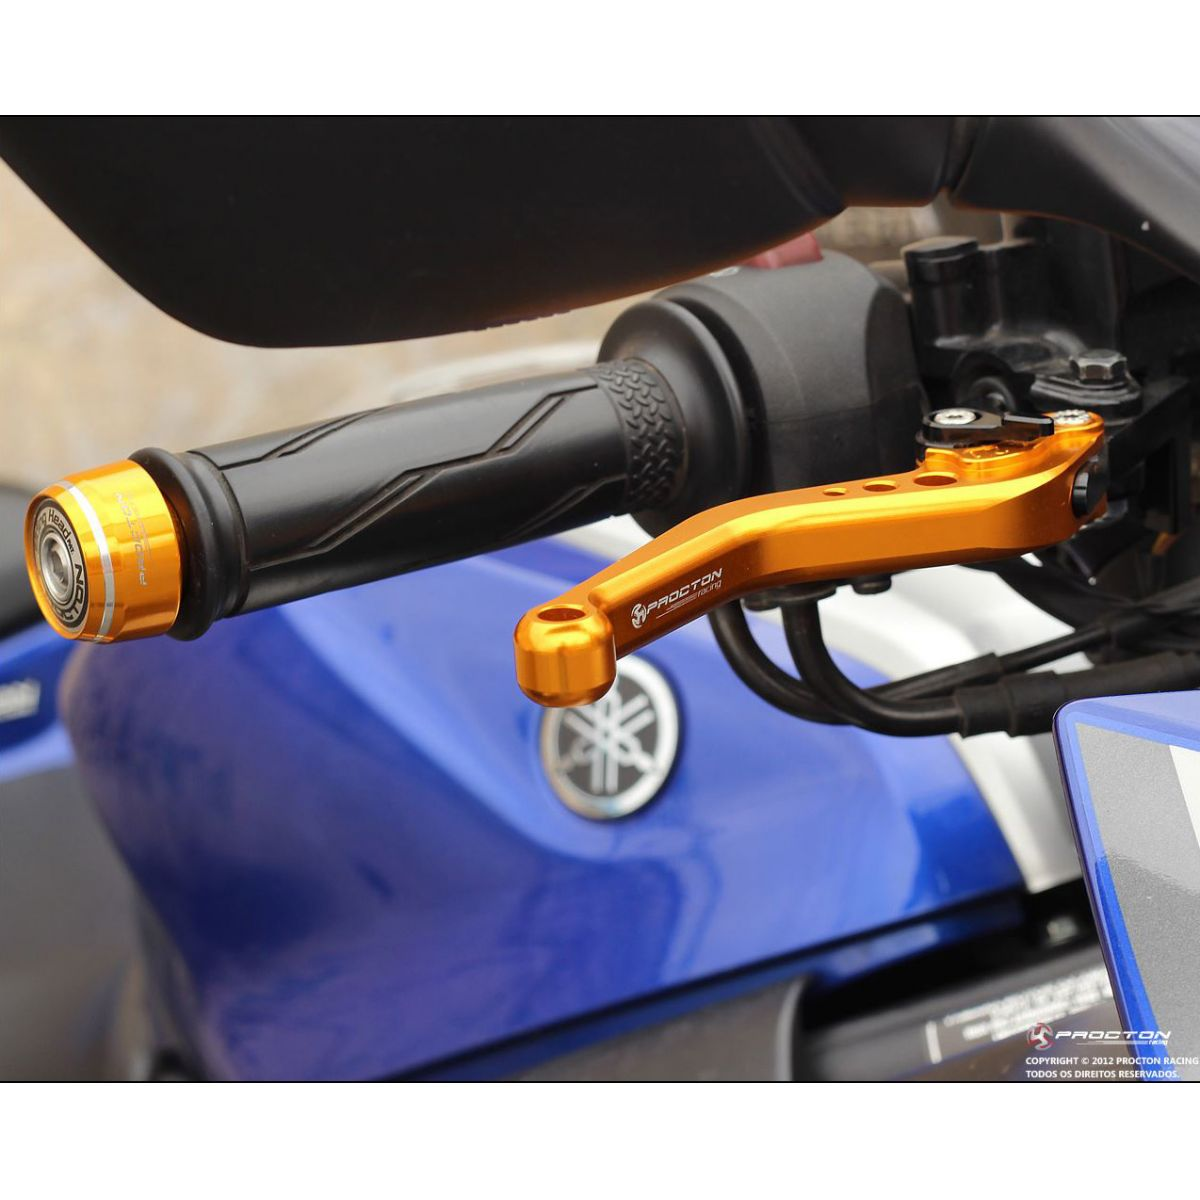 Manete Procton Racing B-KING 2009-2012 (F-35/S-31)  - Nova Suzuki Motos e Acessórios